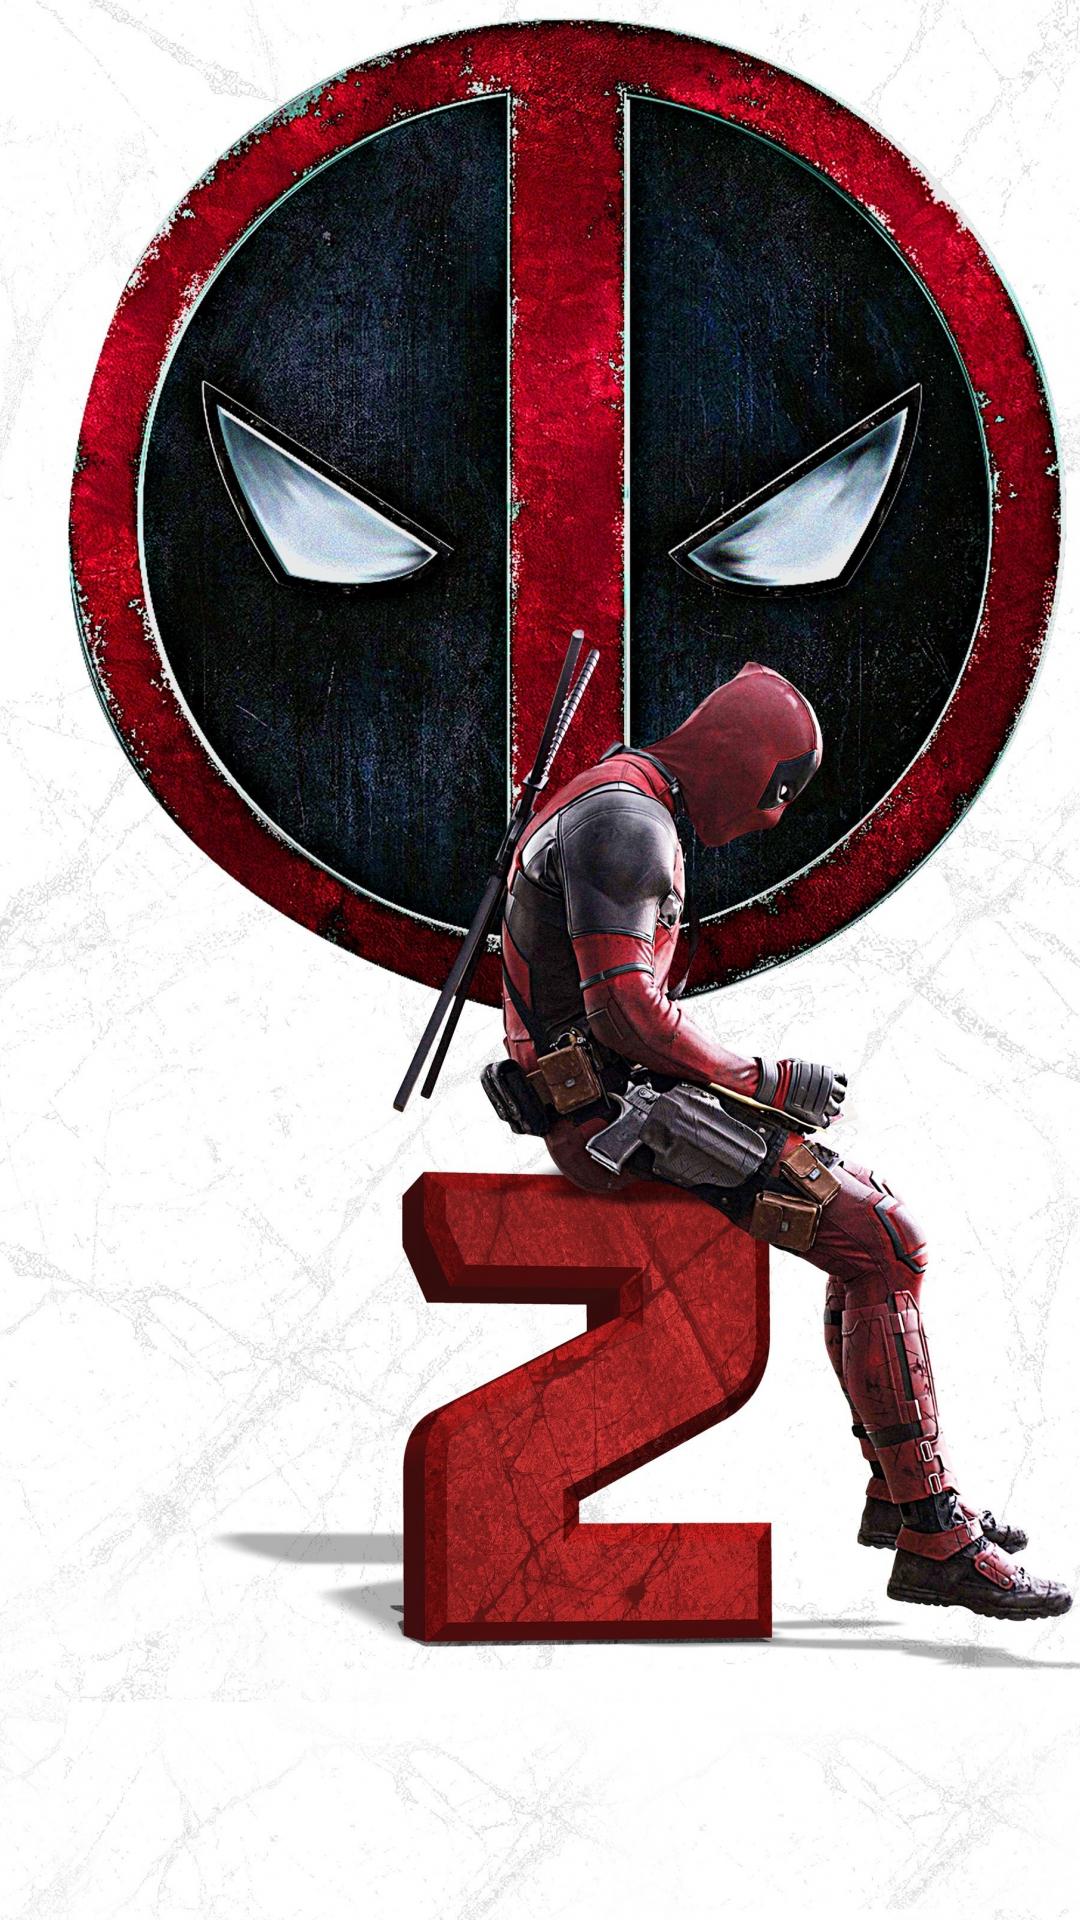 Download 1080x1920 Wallpaper Deadpool 2 2018 Movie